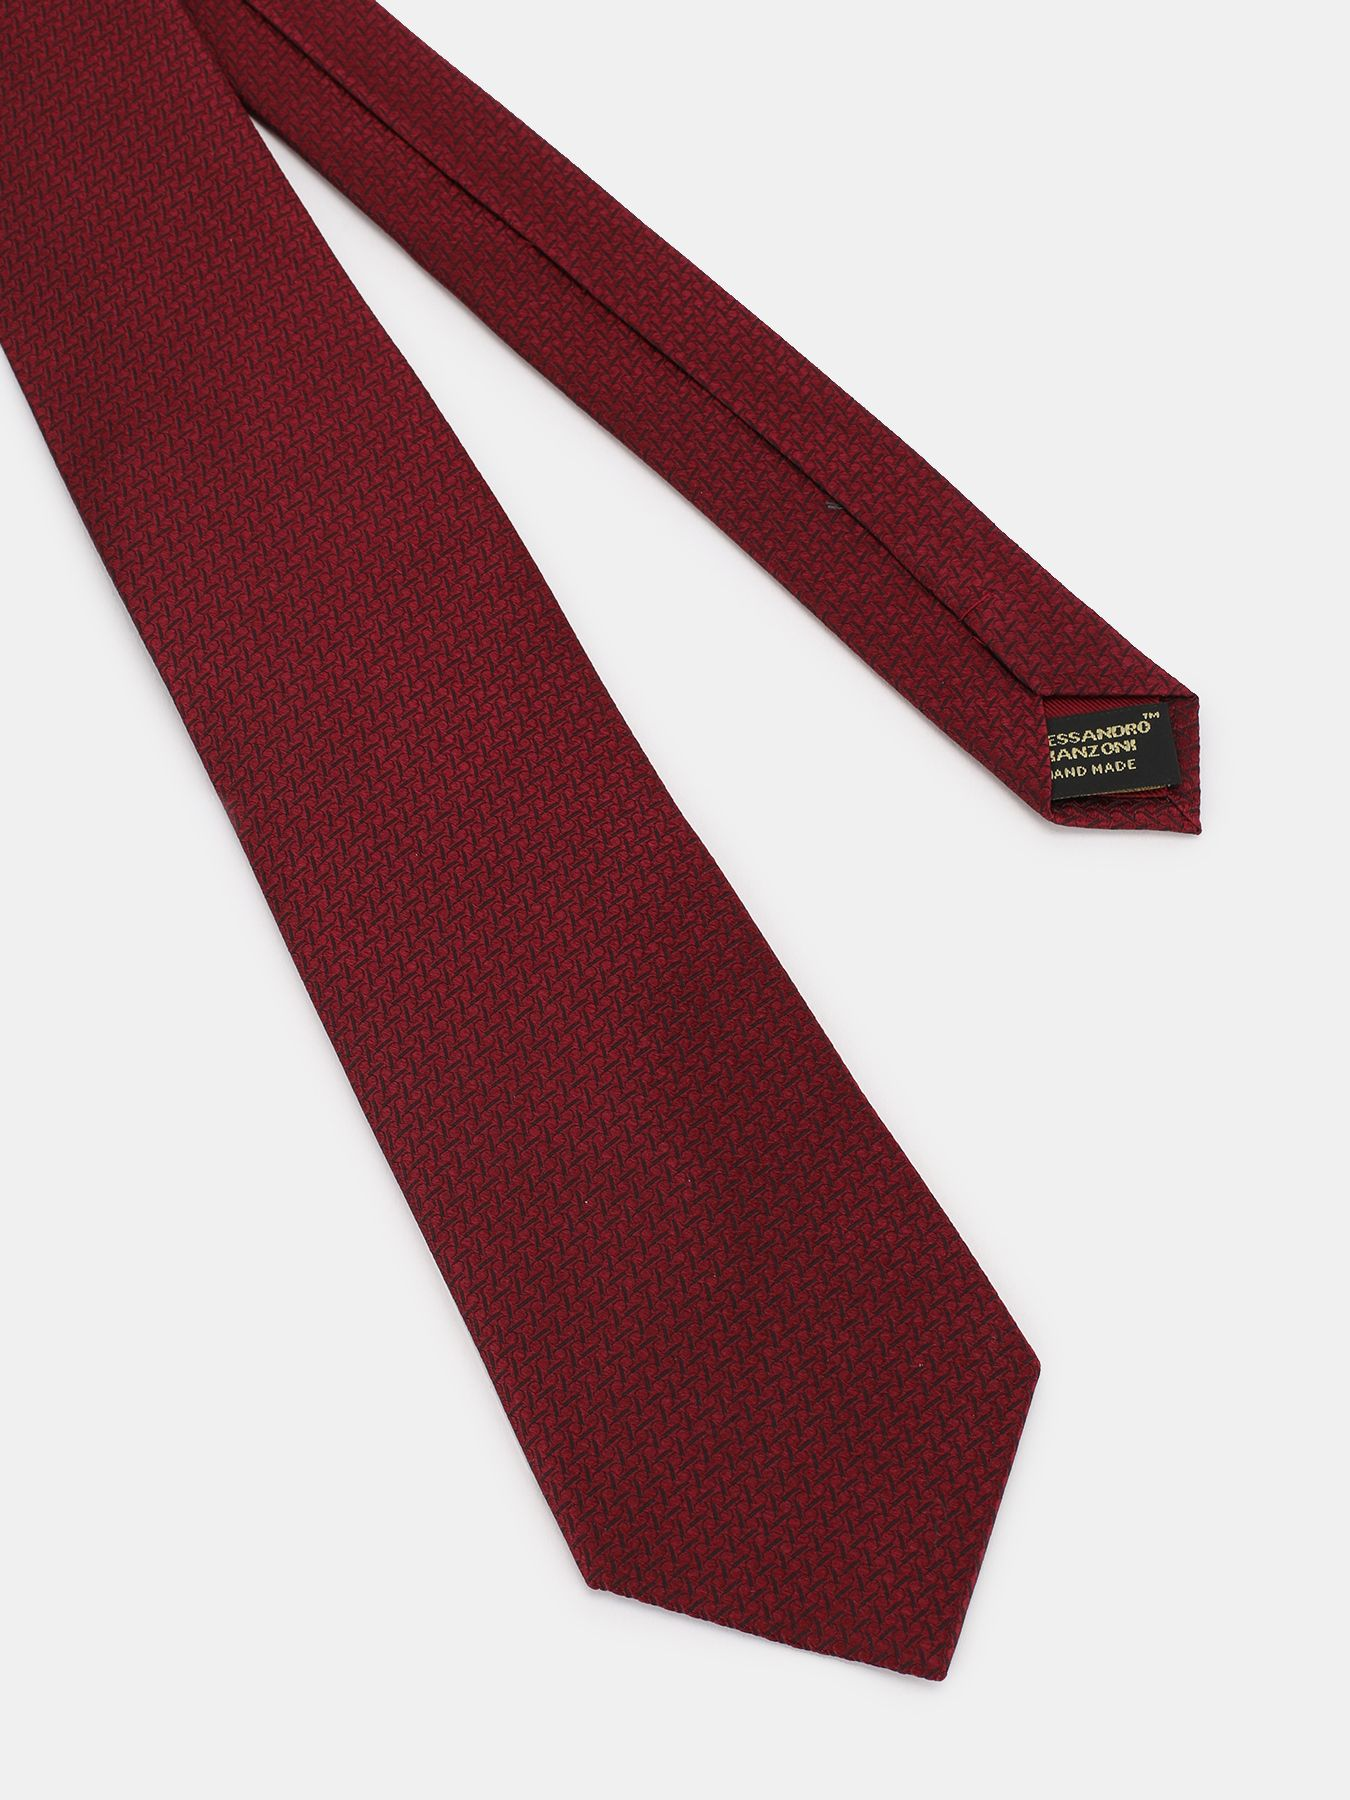 Alessandro Manzoni Шелковый галстук с узорами 324195-185 Фото 3